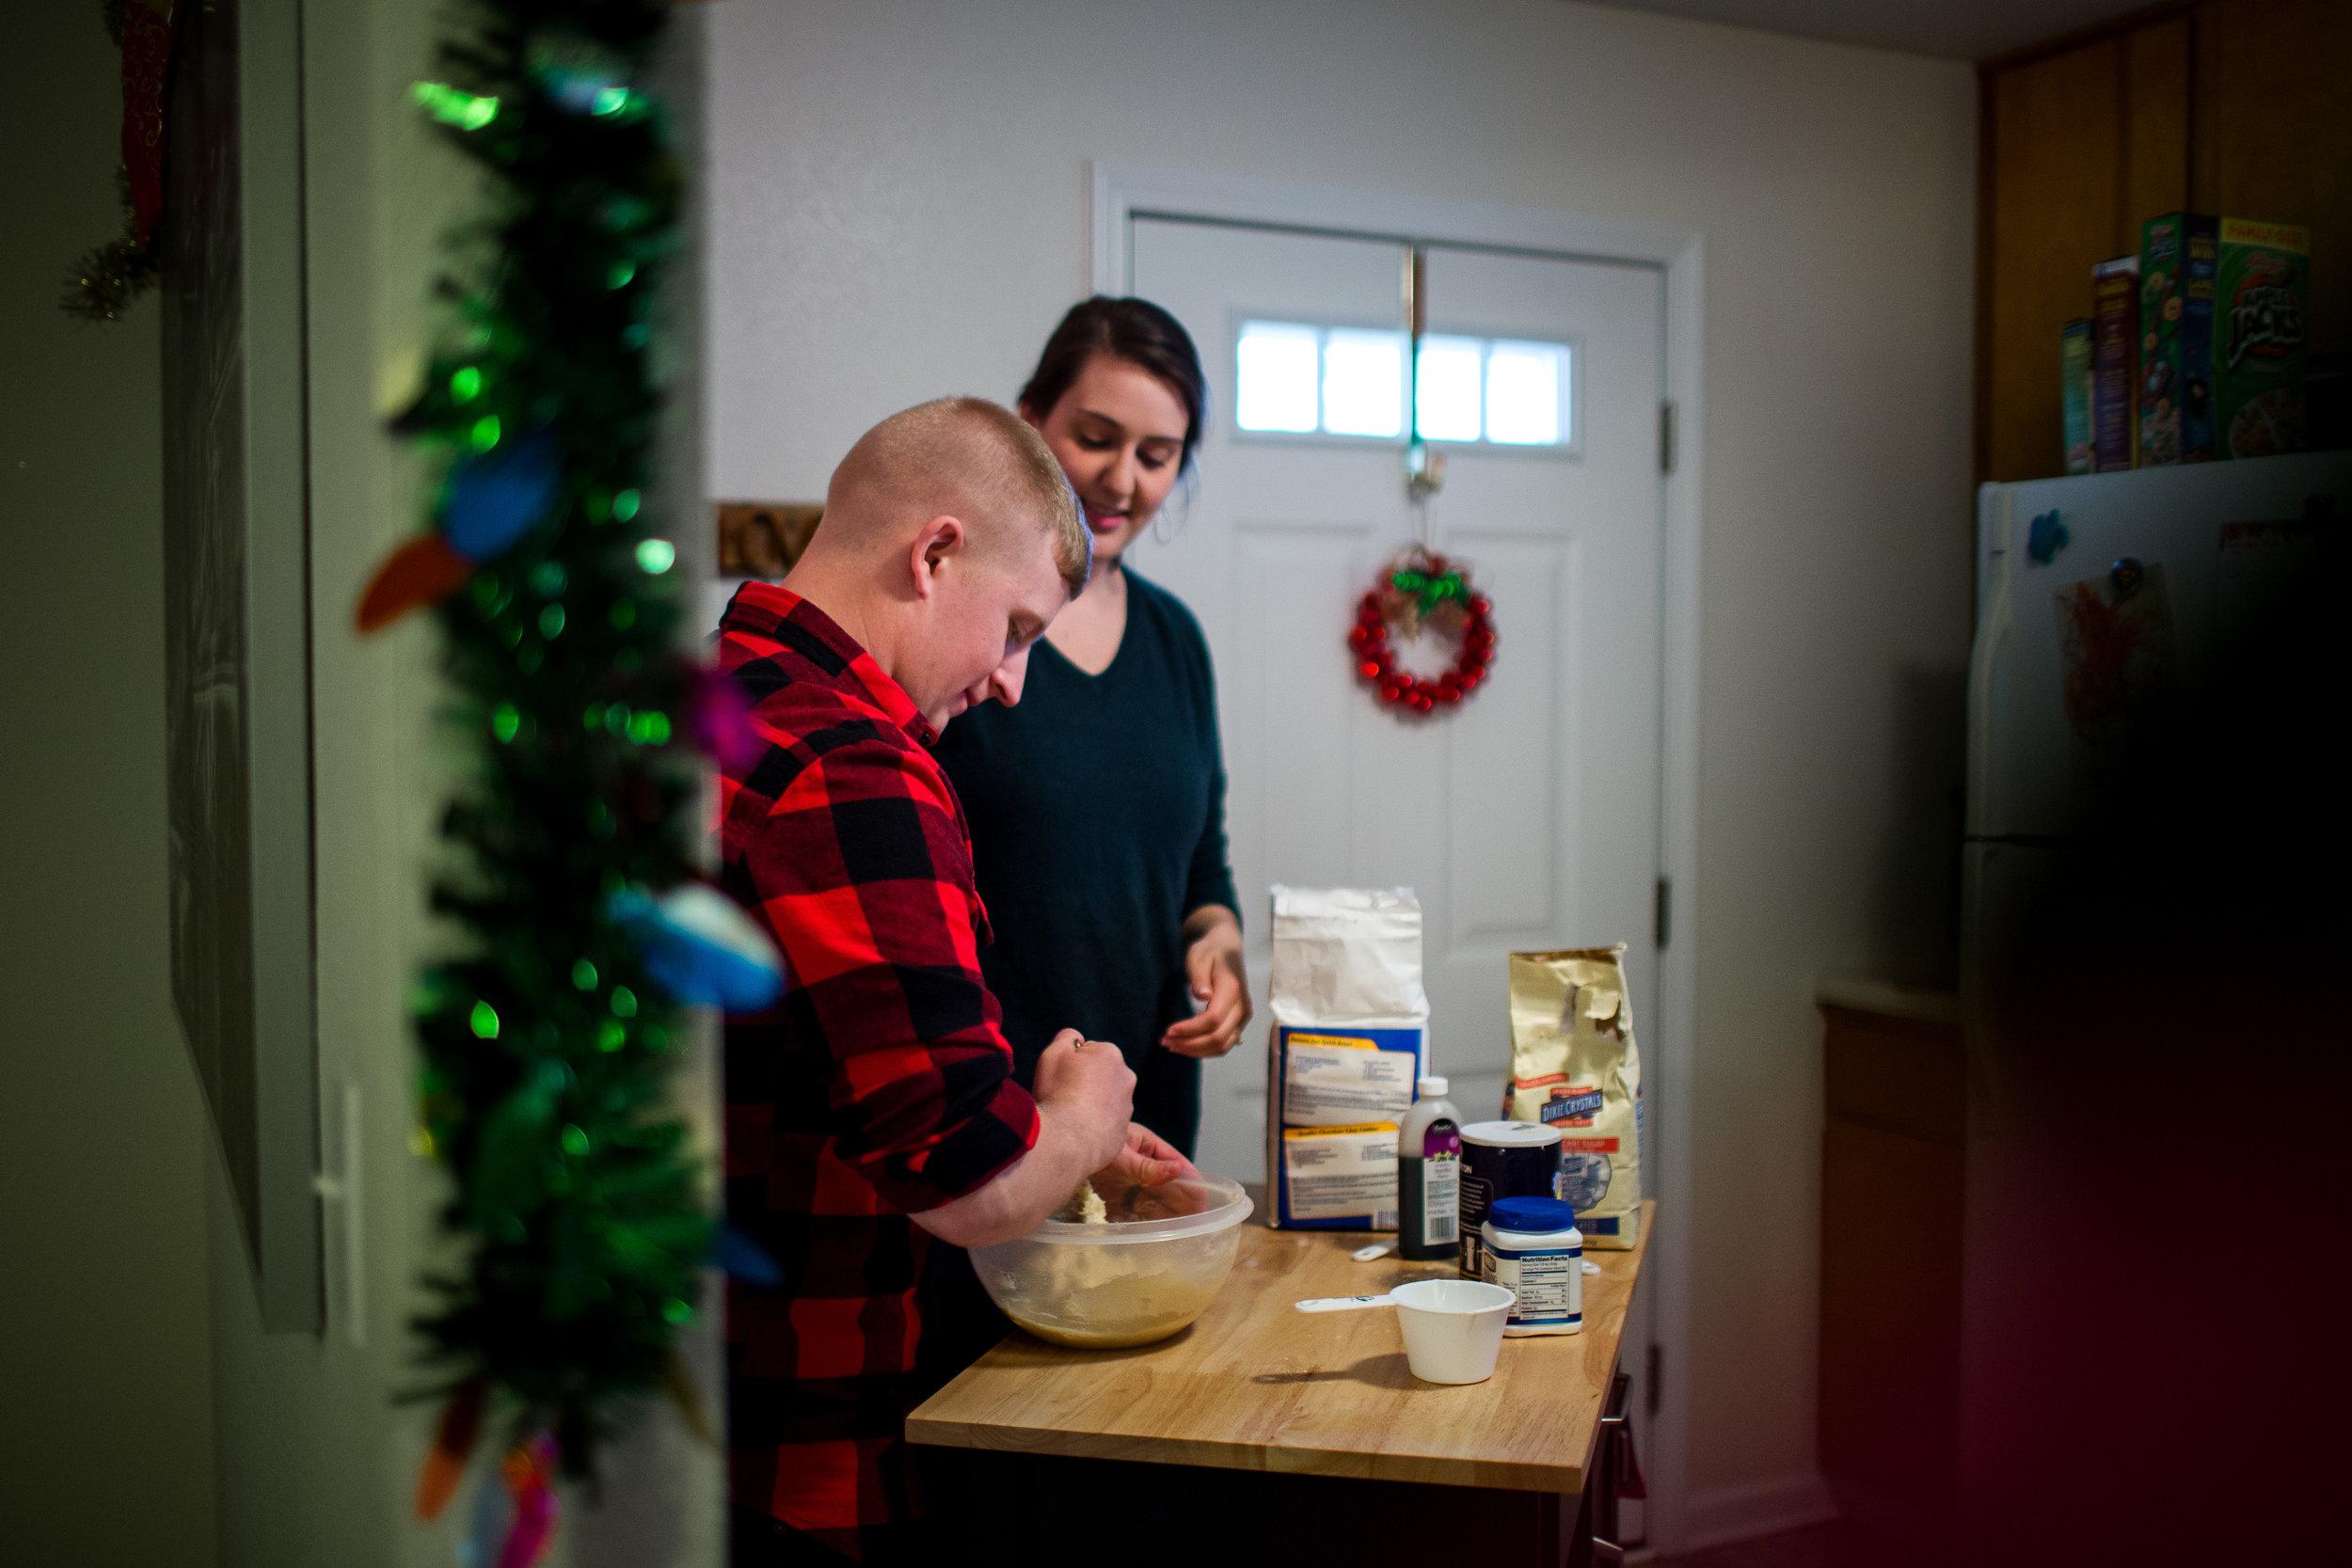 Christmas couples photos lifestyle baking cookies